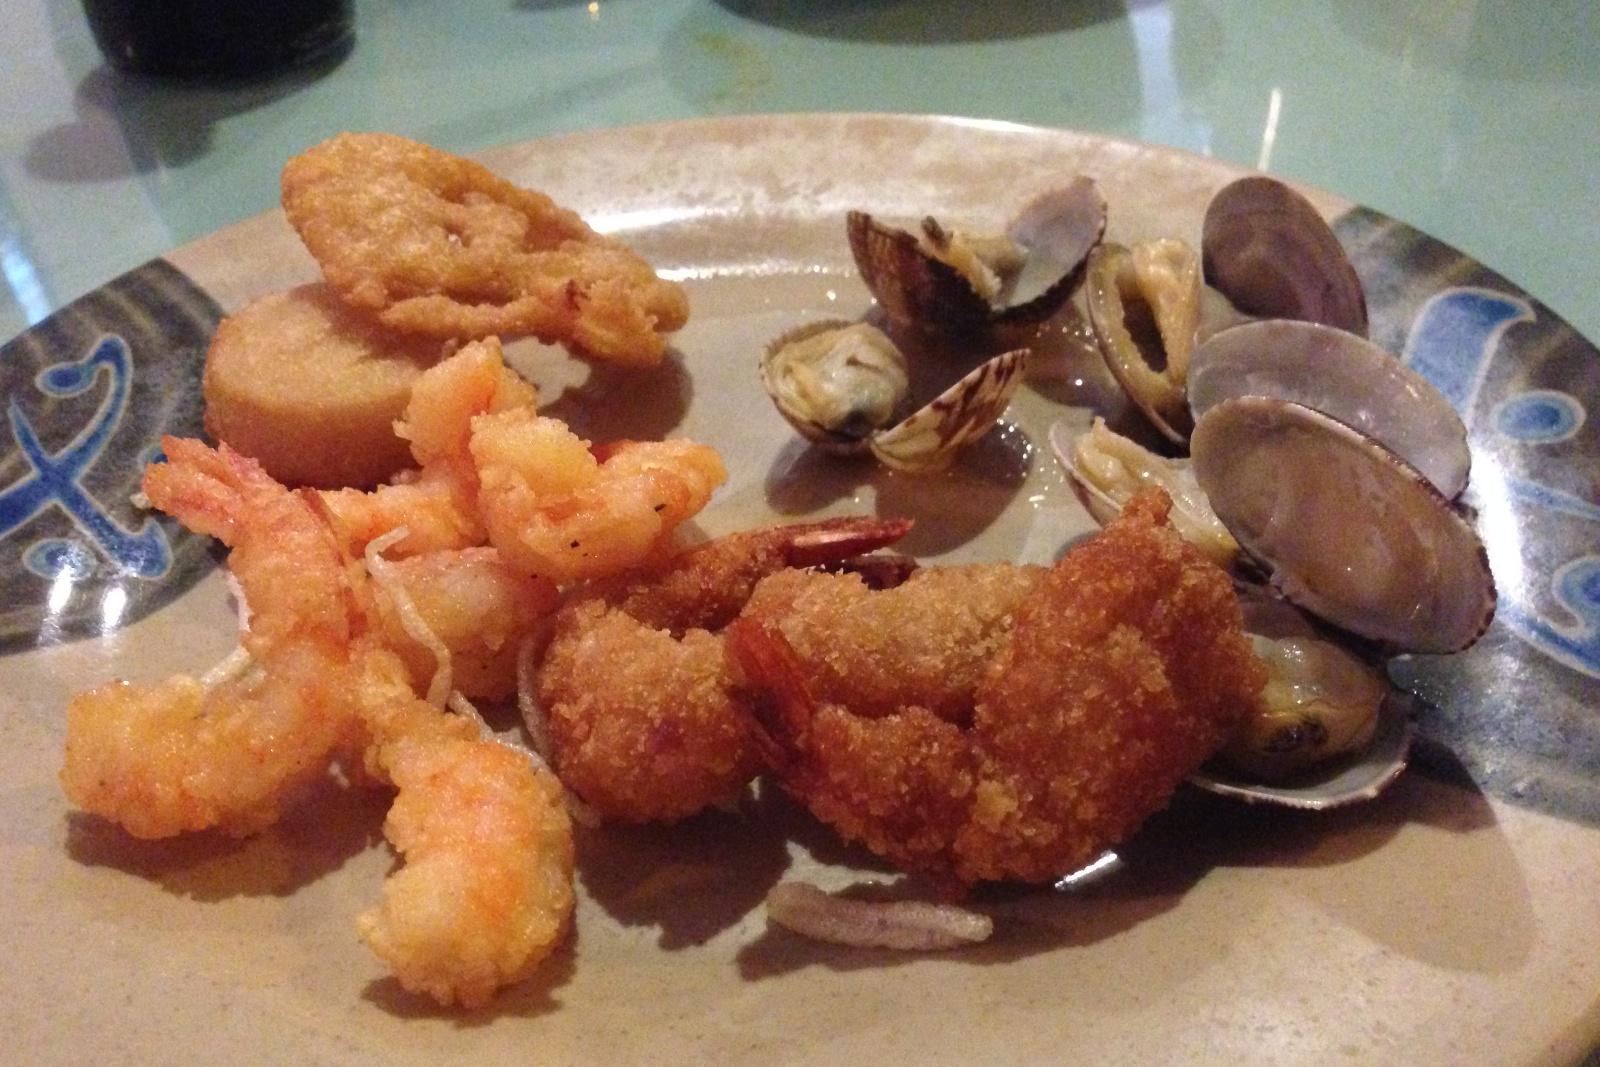 http://blog.rickk.com/food/2014/09/21/ate.2014.09.21.d2.jpg